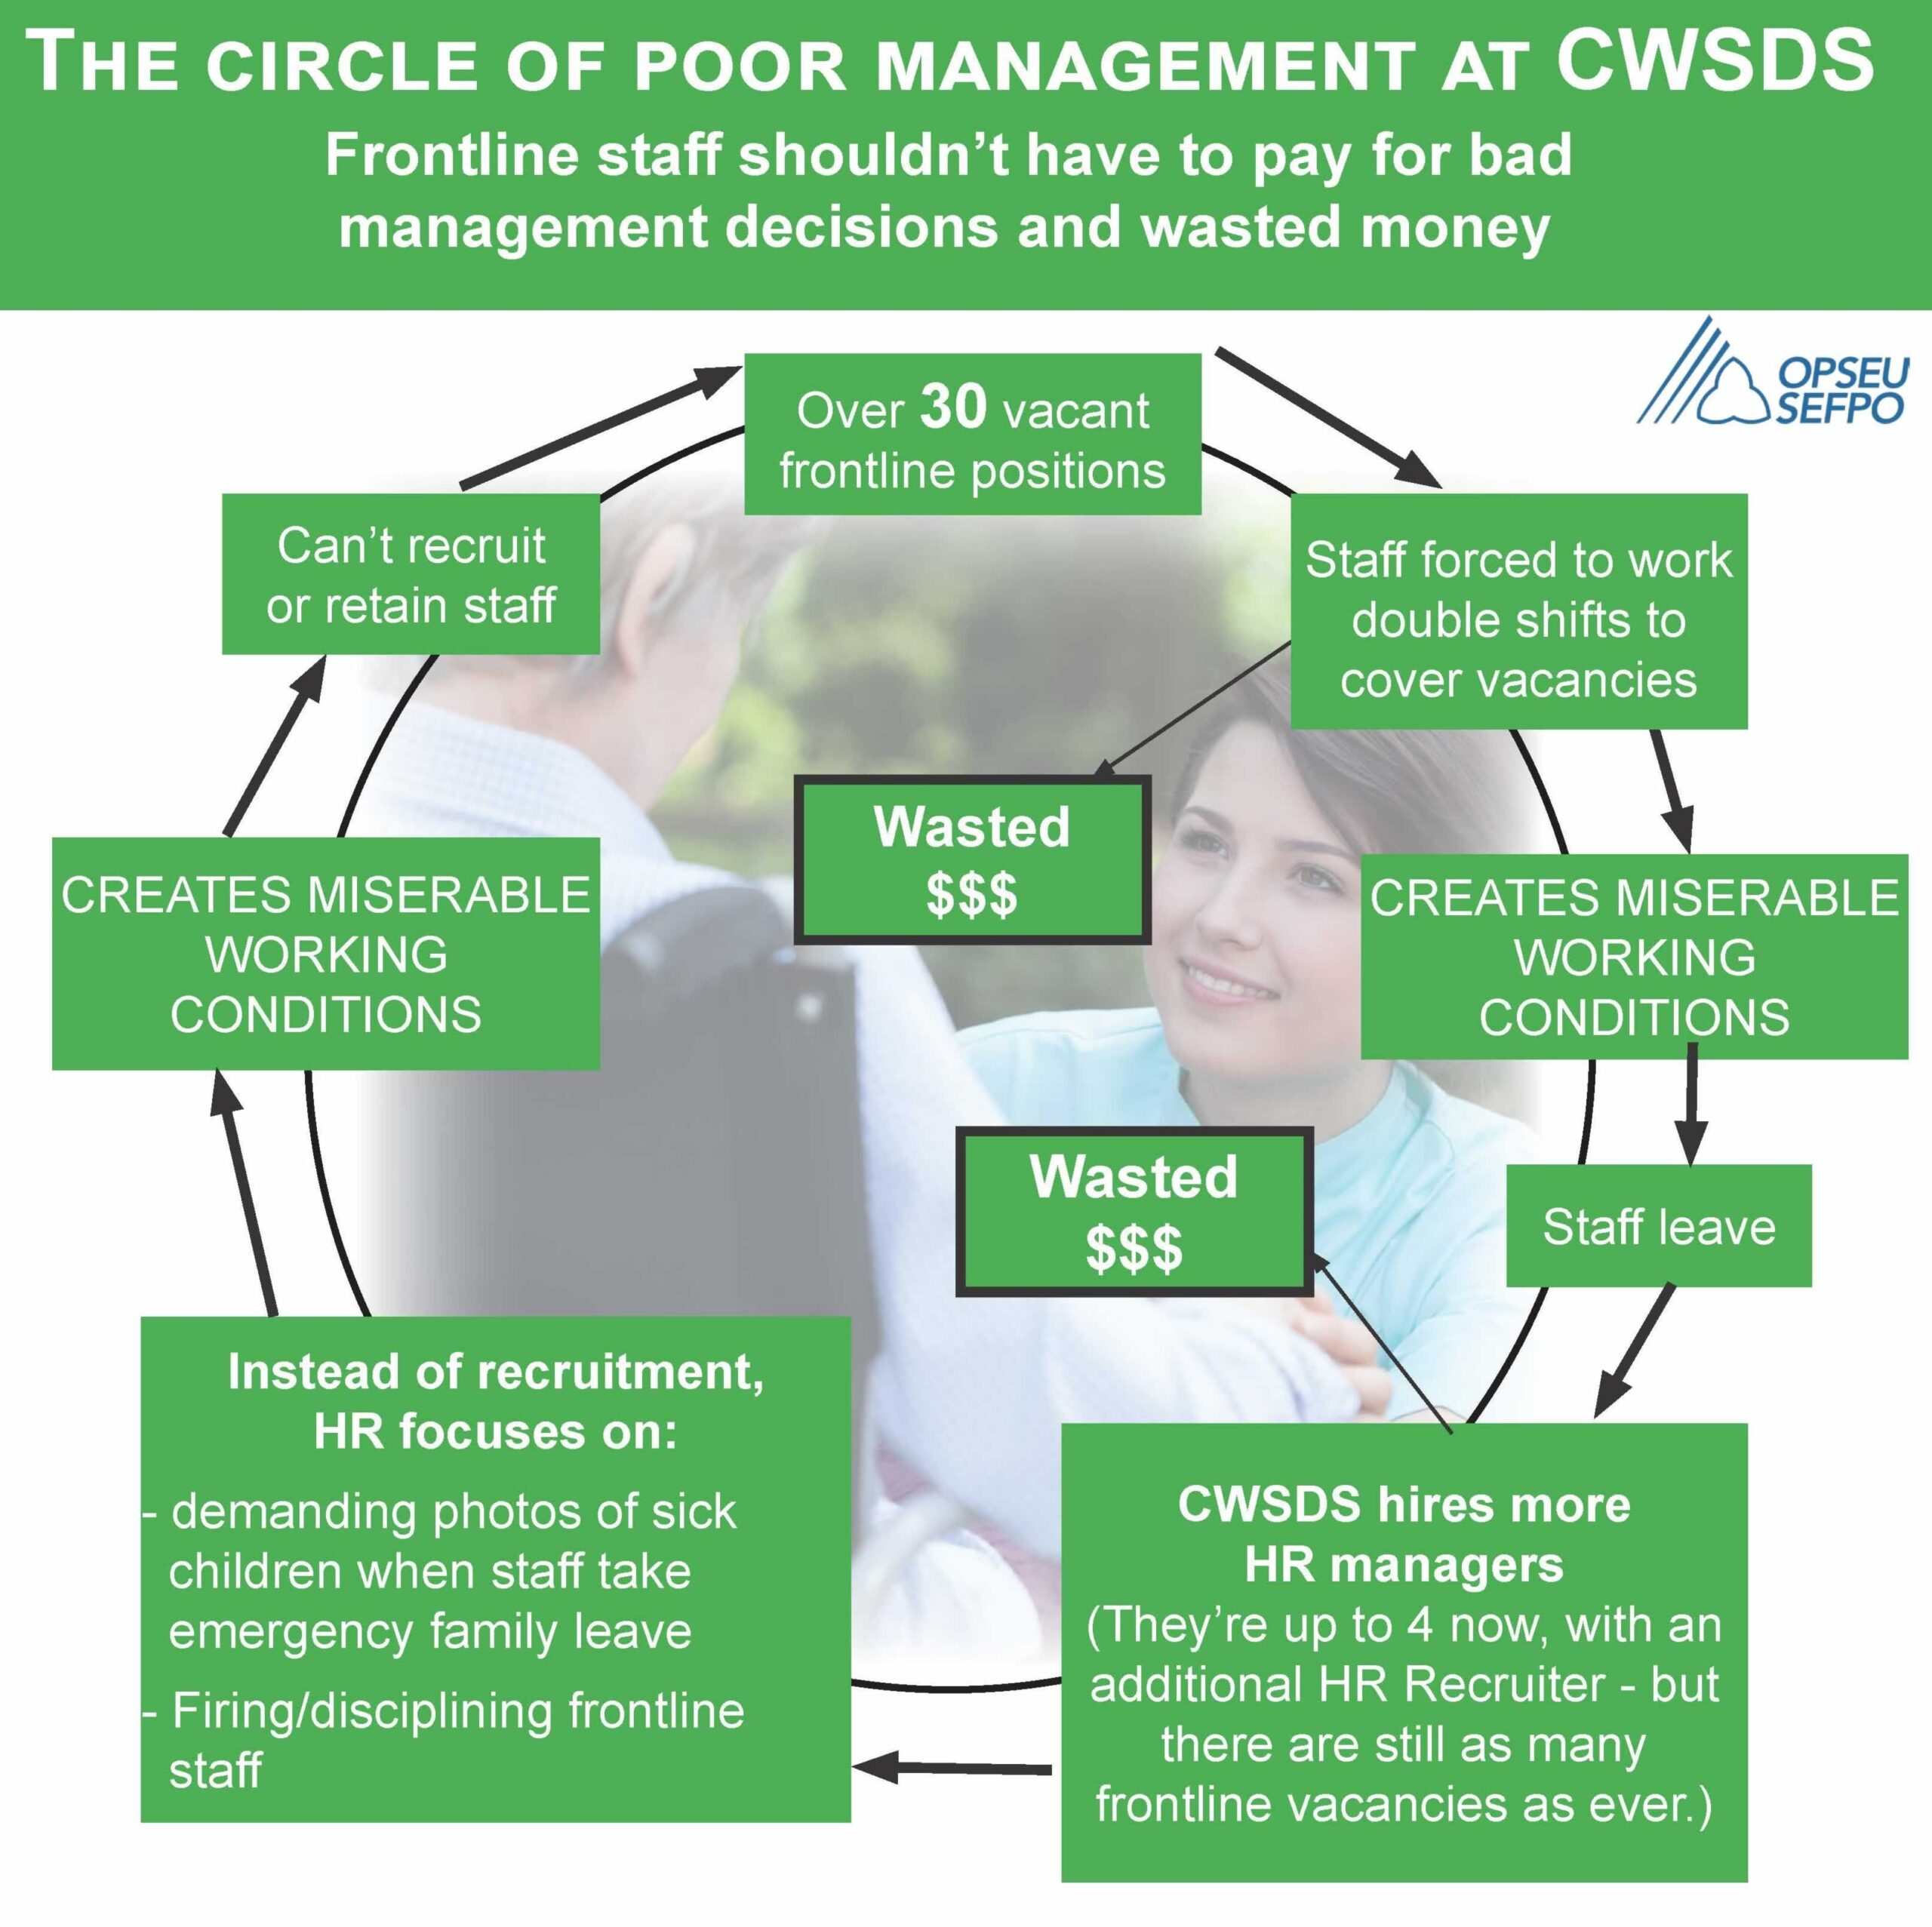 cwsdscirclepoormanagement.jpg